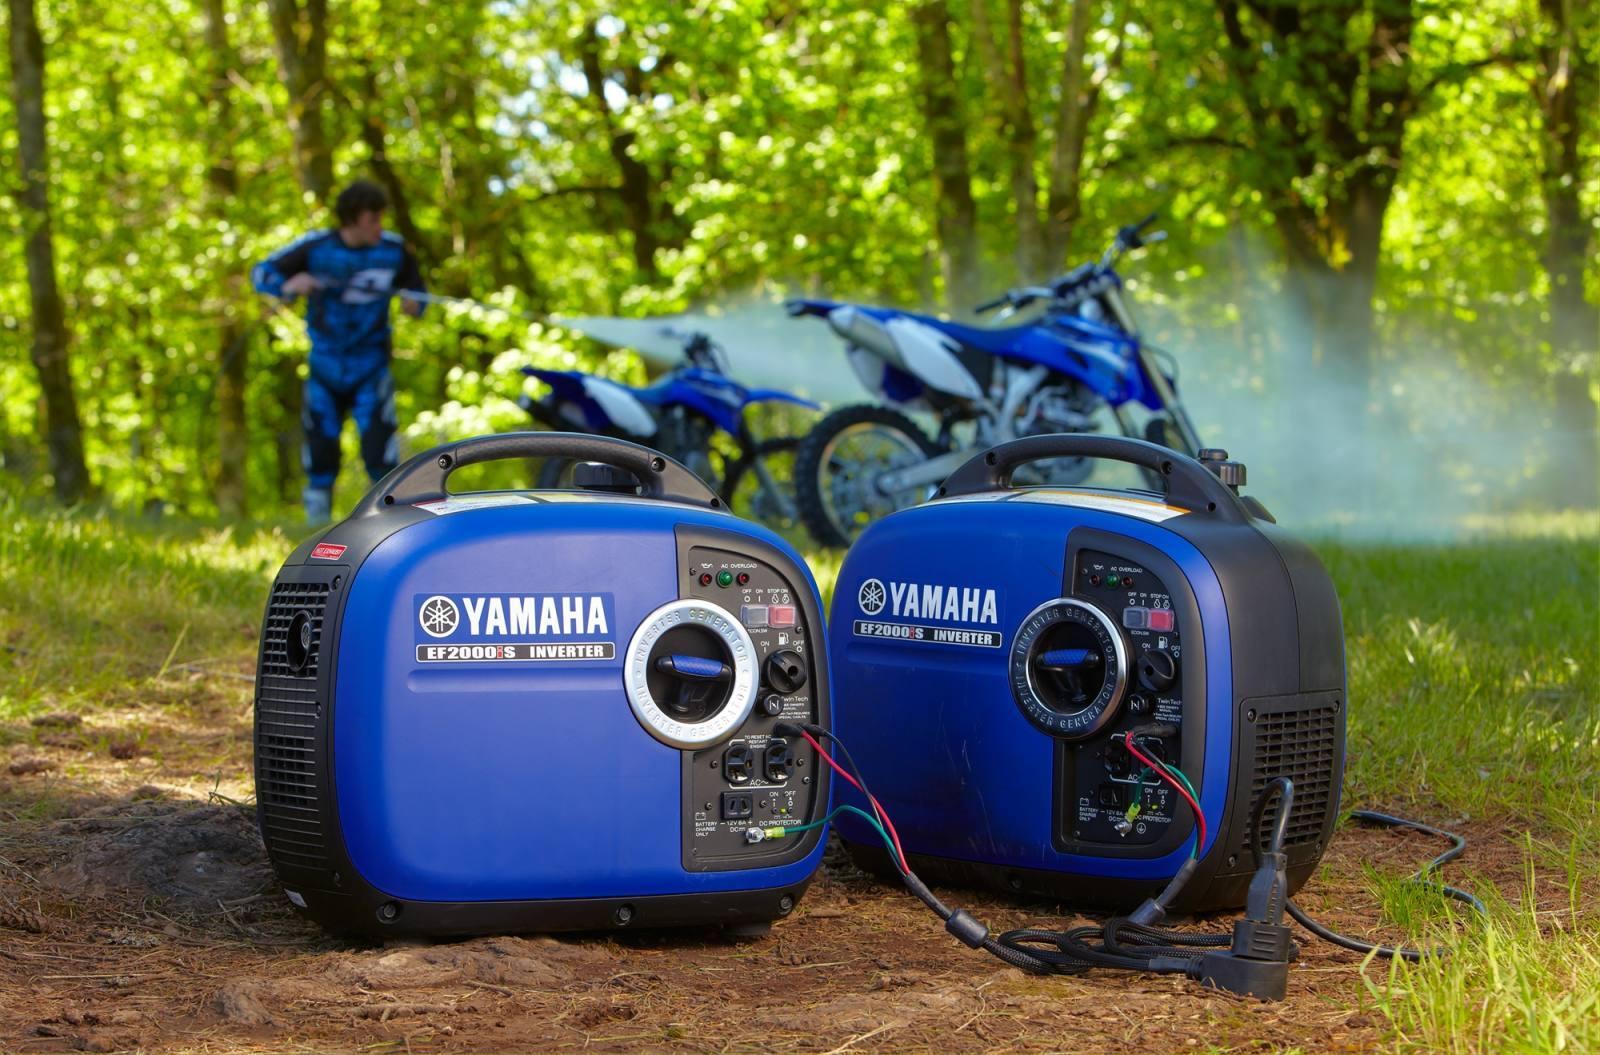 Инверторный бензогенератор плюсы и минусы Yamaha 2000